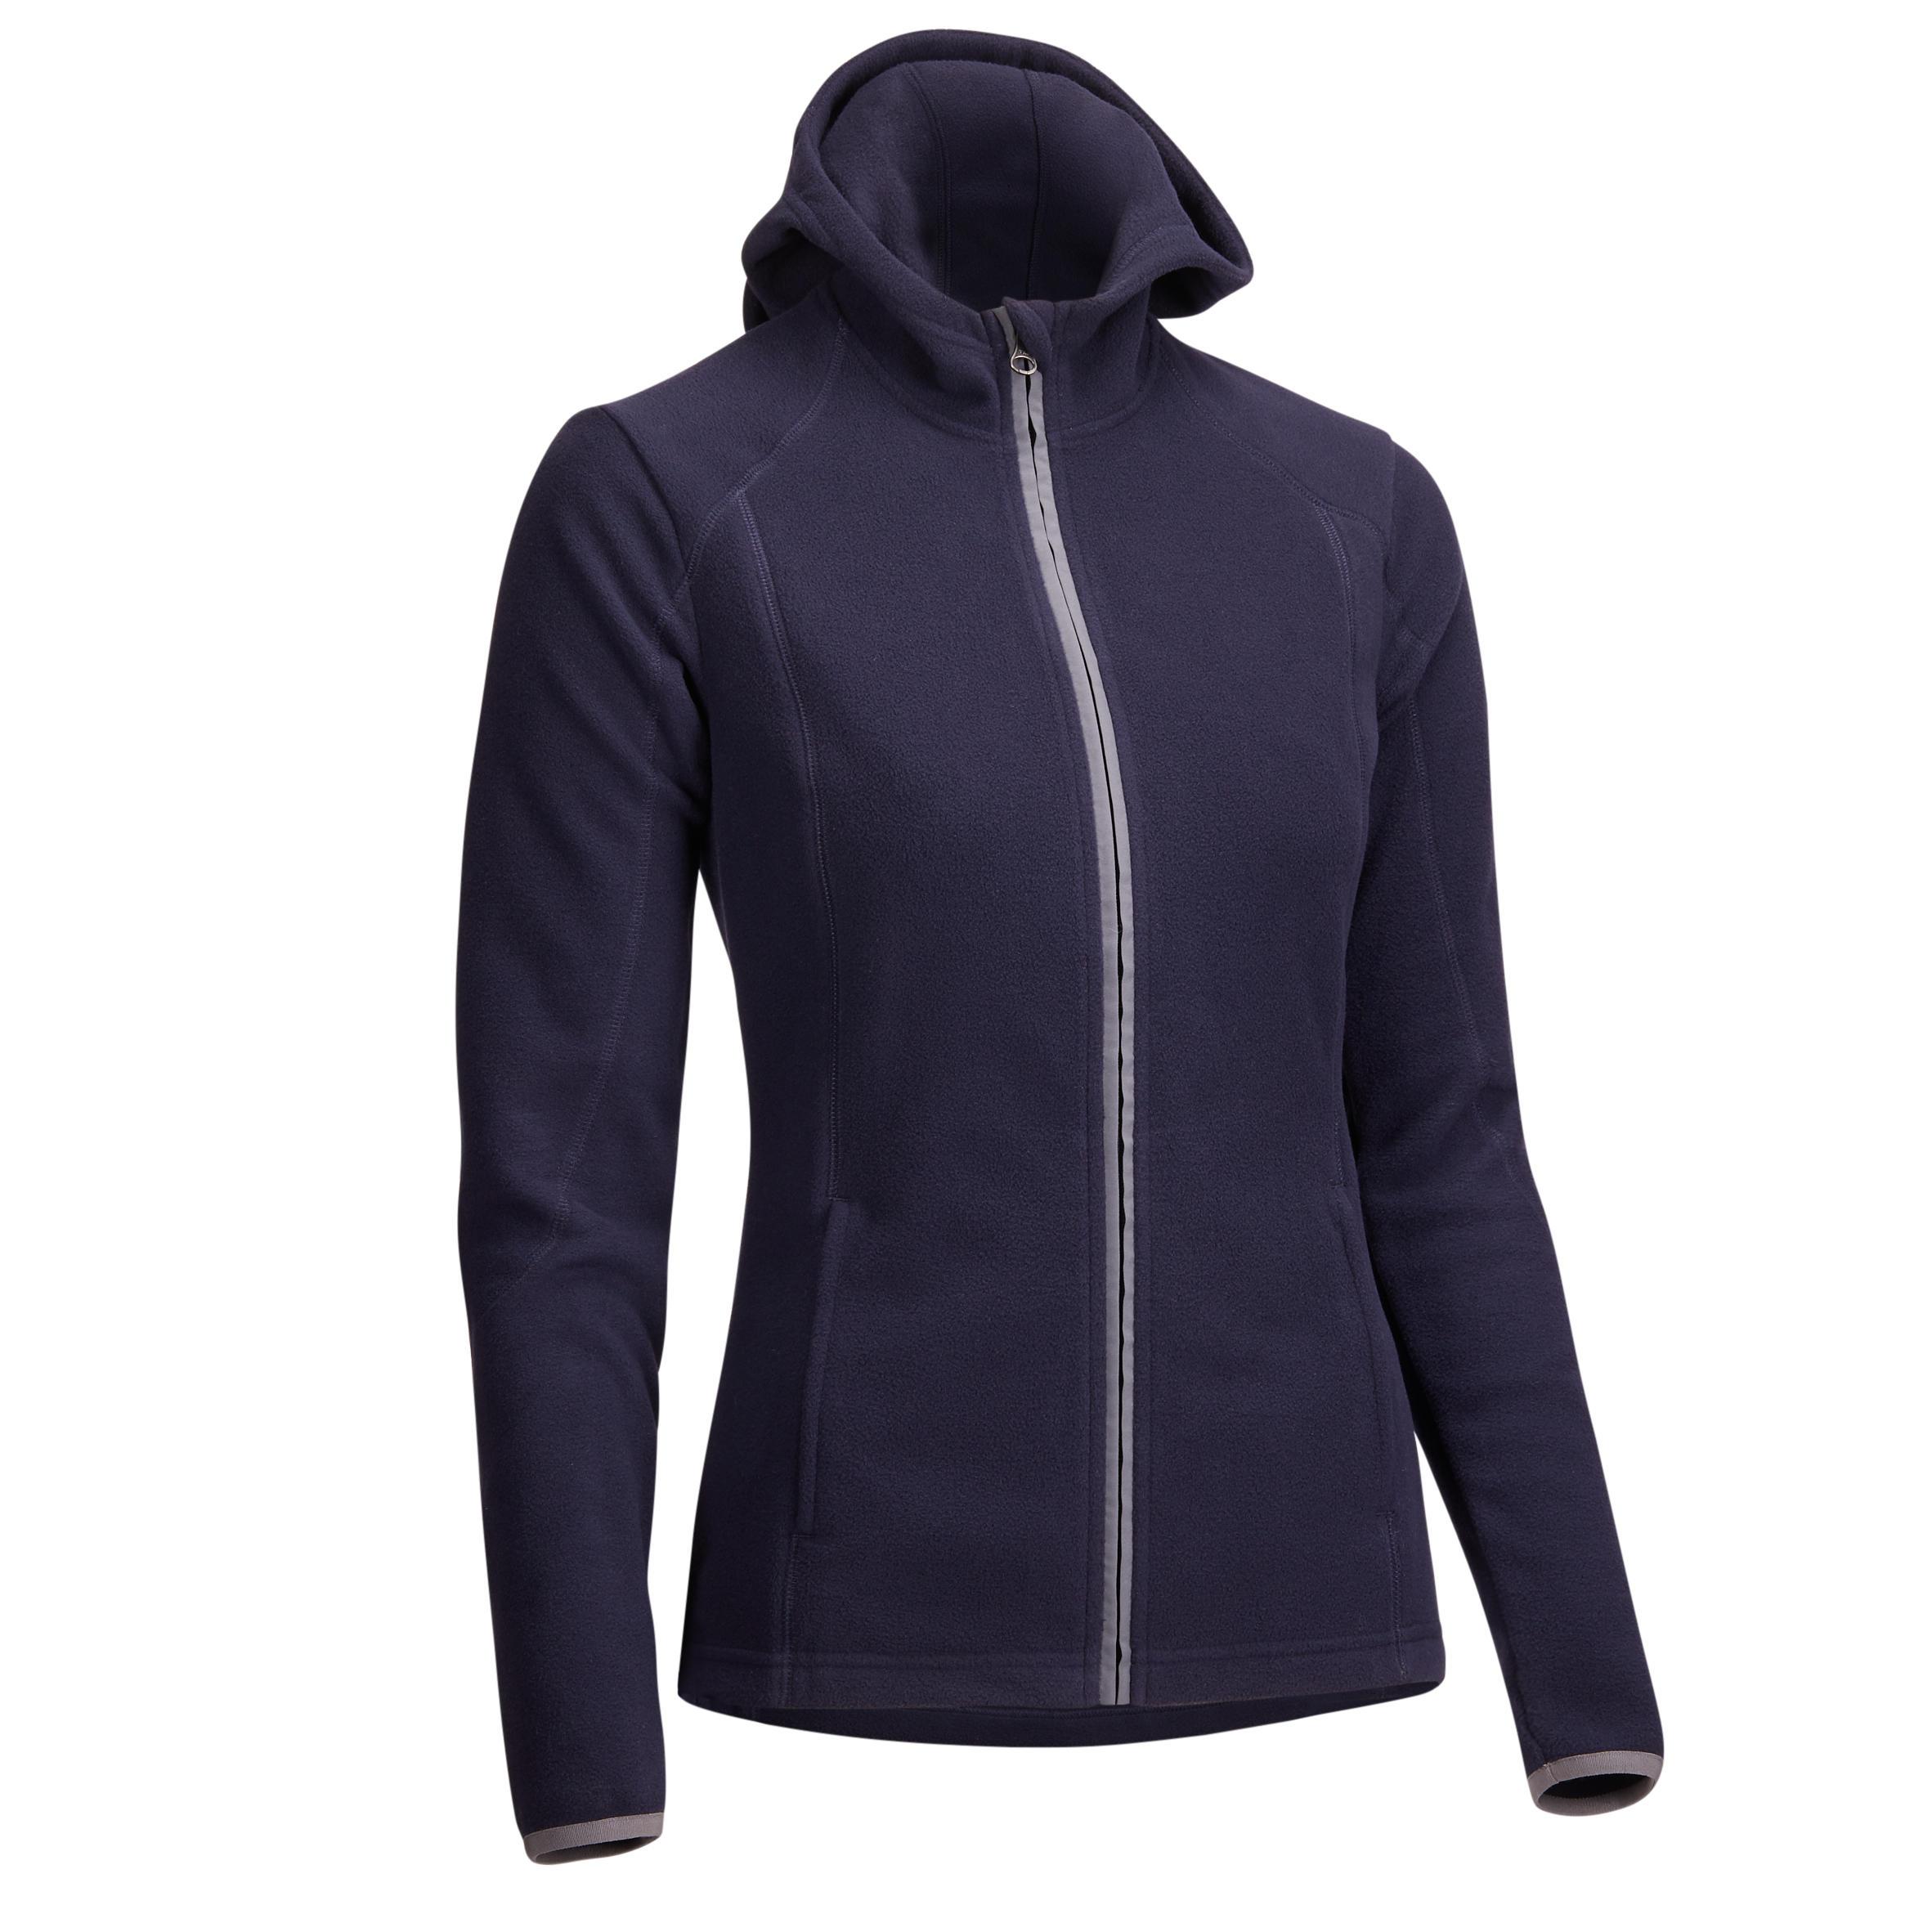 Reitfleecejacke mit innovativer Kapuze 2-in-1 Damen marineblau | Bekleidung > Jacken > Fleecejacken | Blau | Fouganza